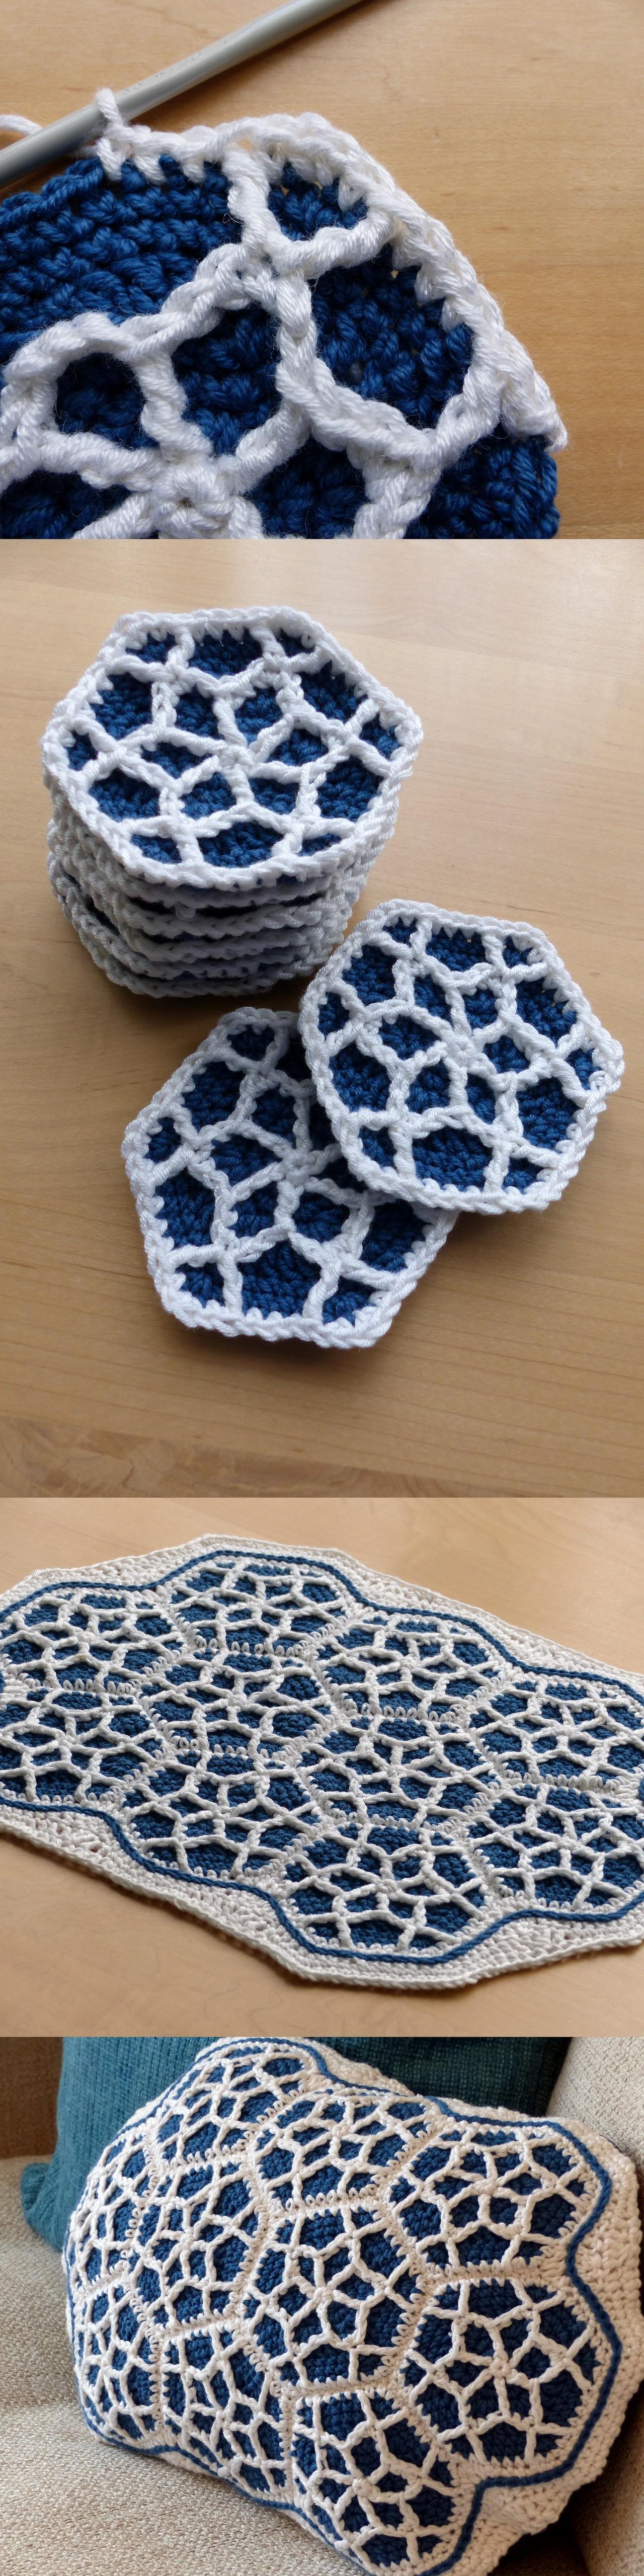 Free Crochet Pattern Octagon Motif : Moroccan Motif Cushion Make My Day Creative